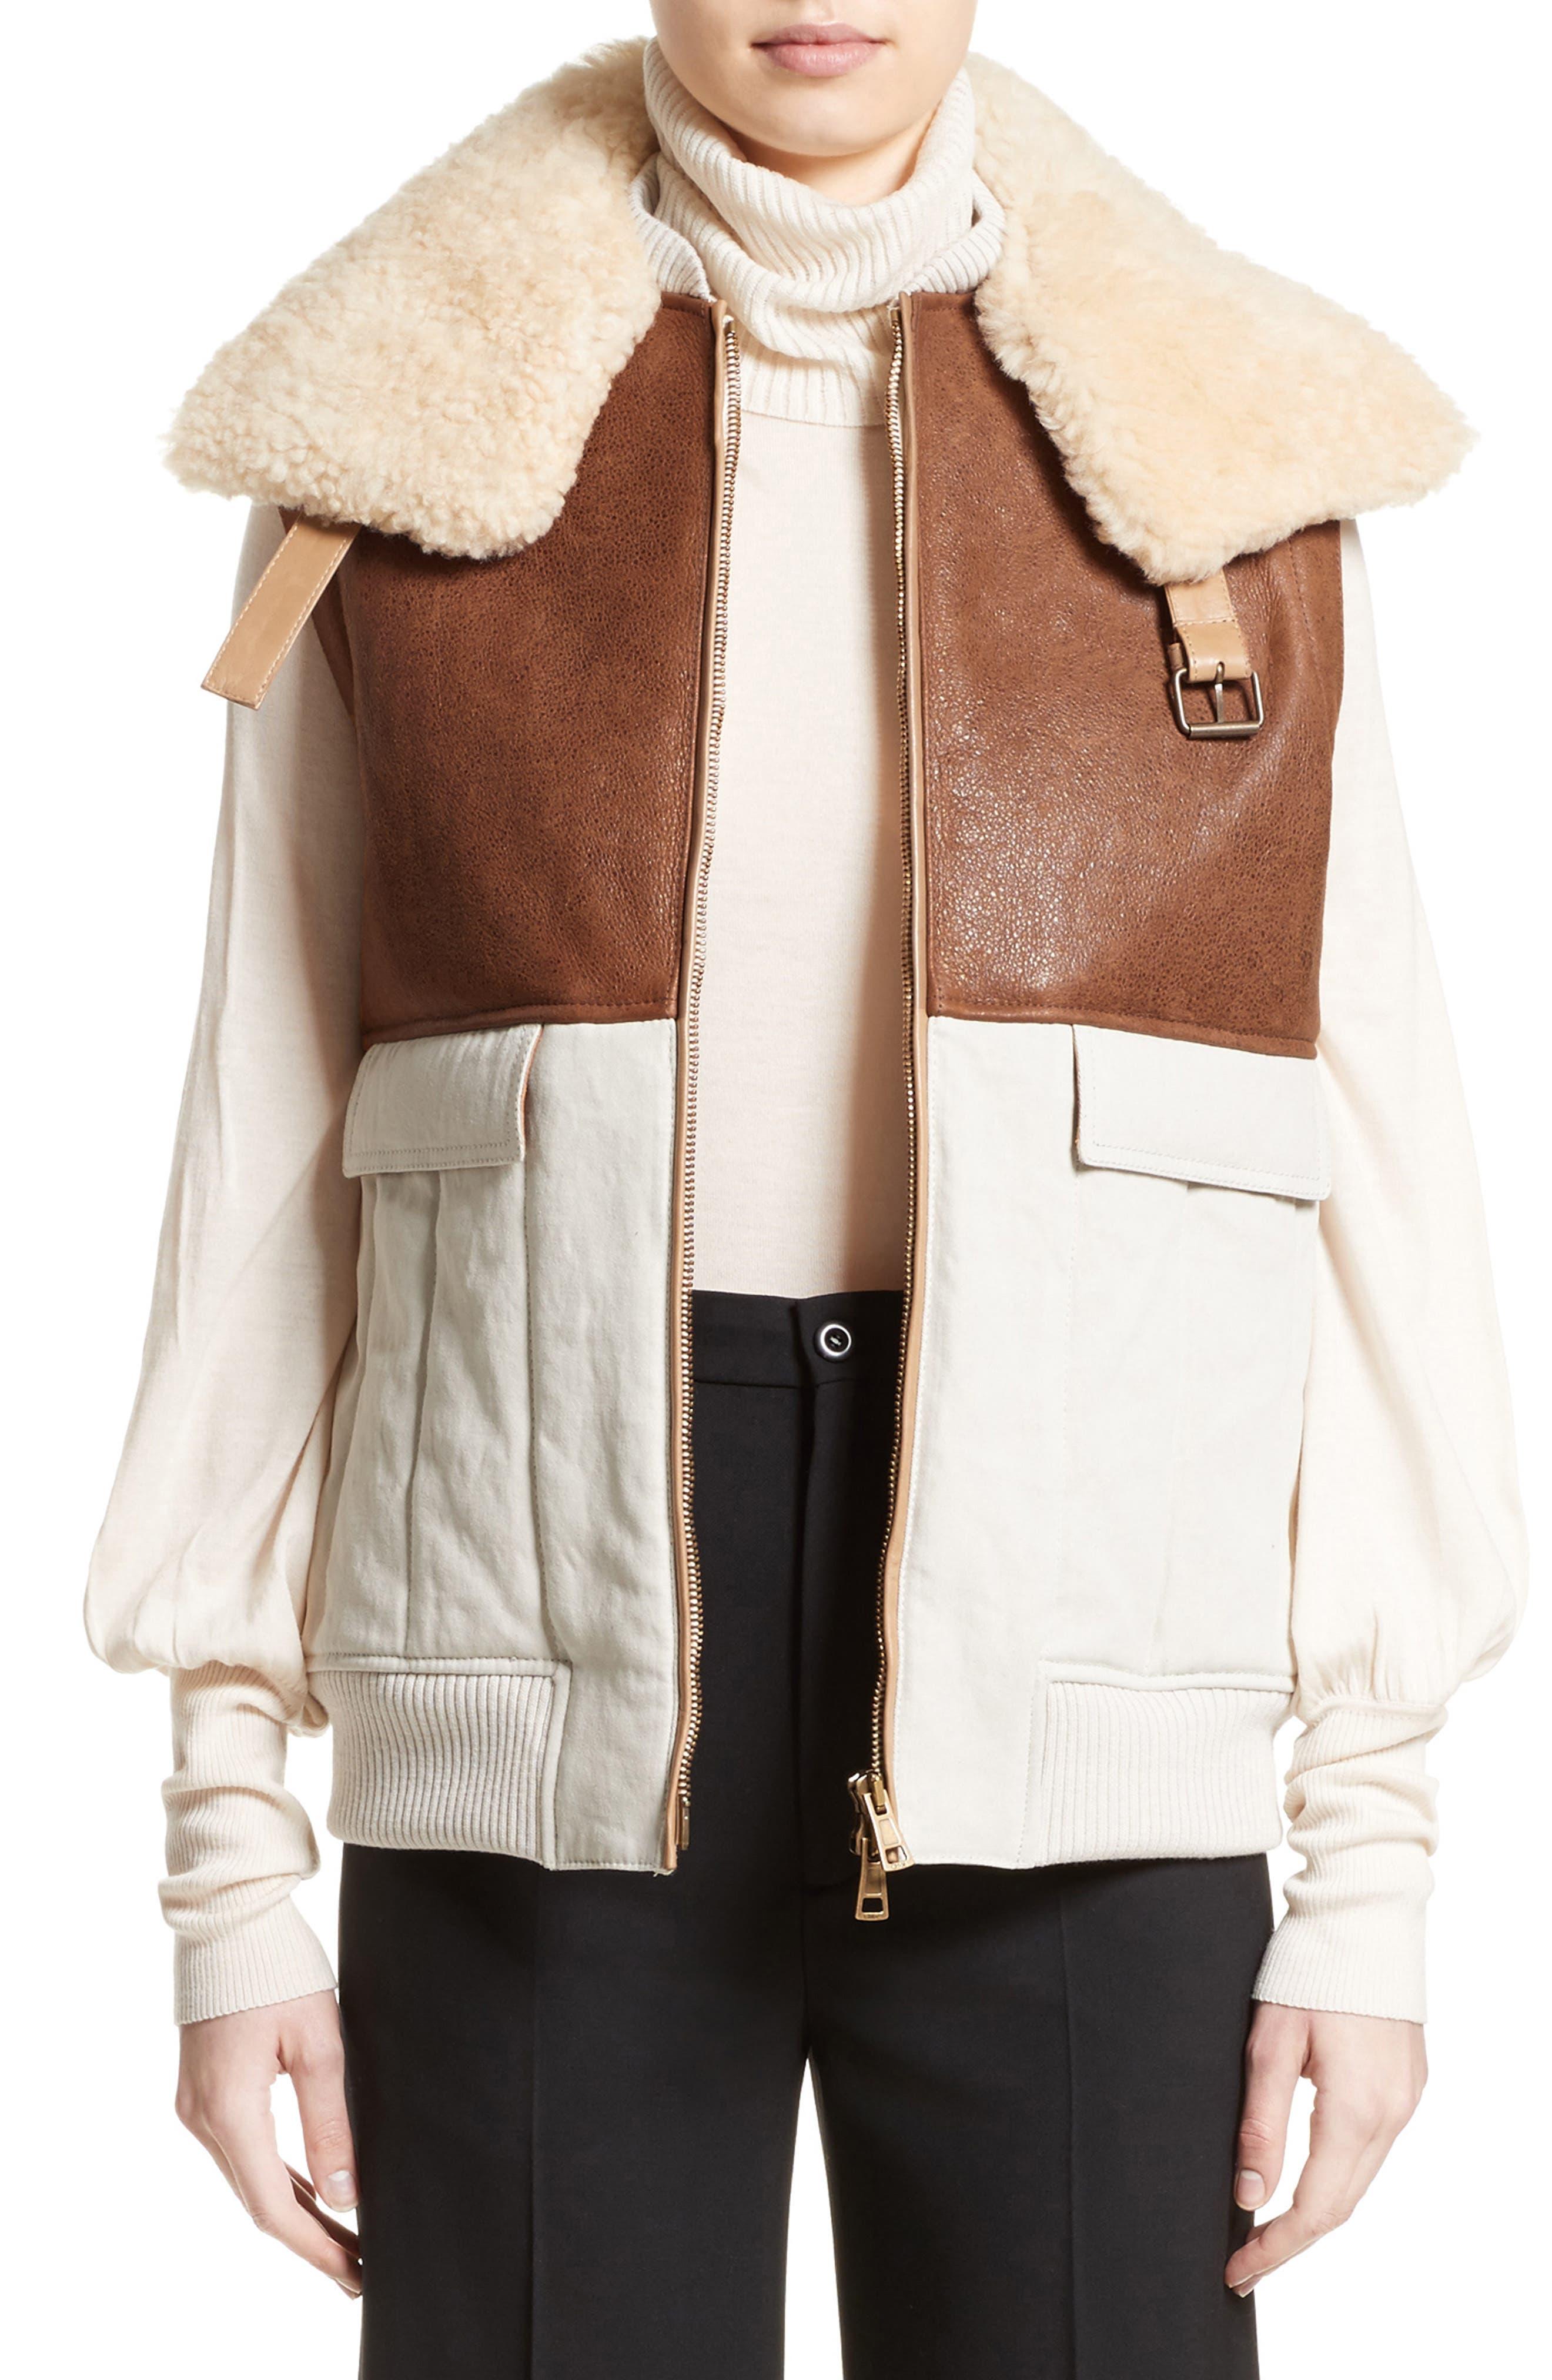 Alternate Image 1 Selected - Chloé Genuine Shearling Trim Leather & Cotton Vest